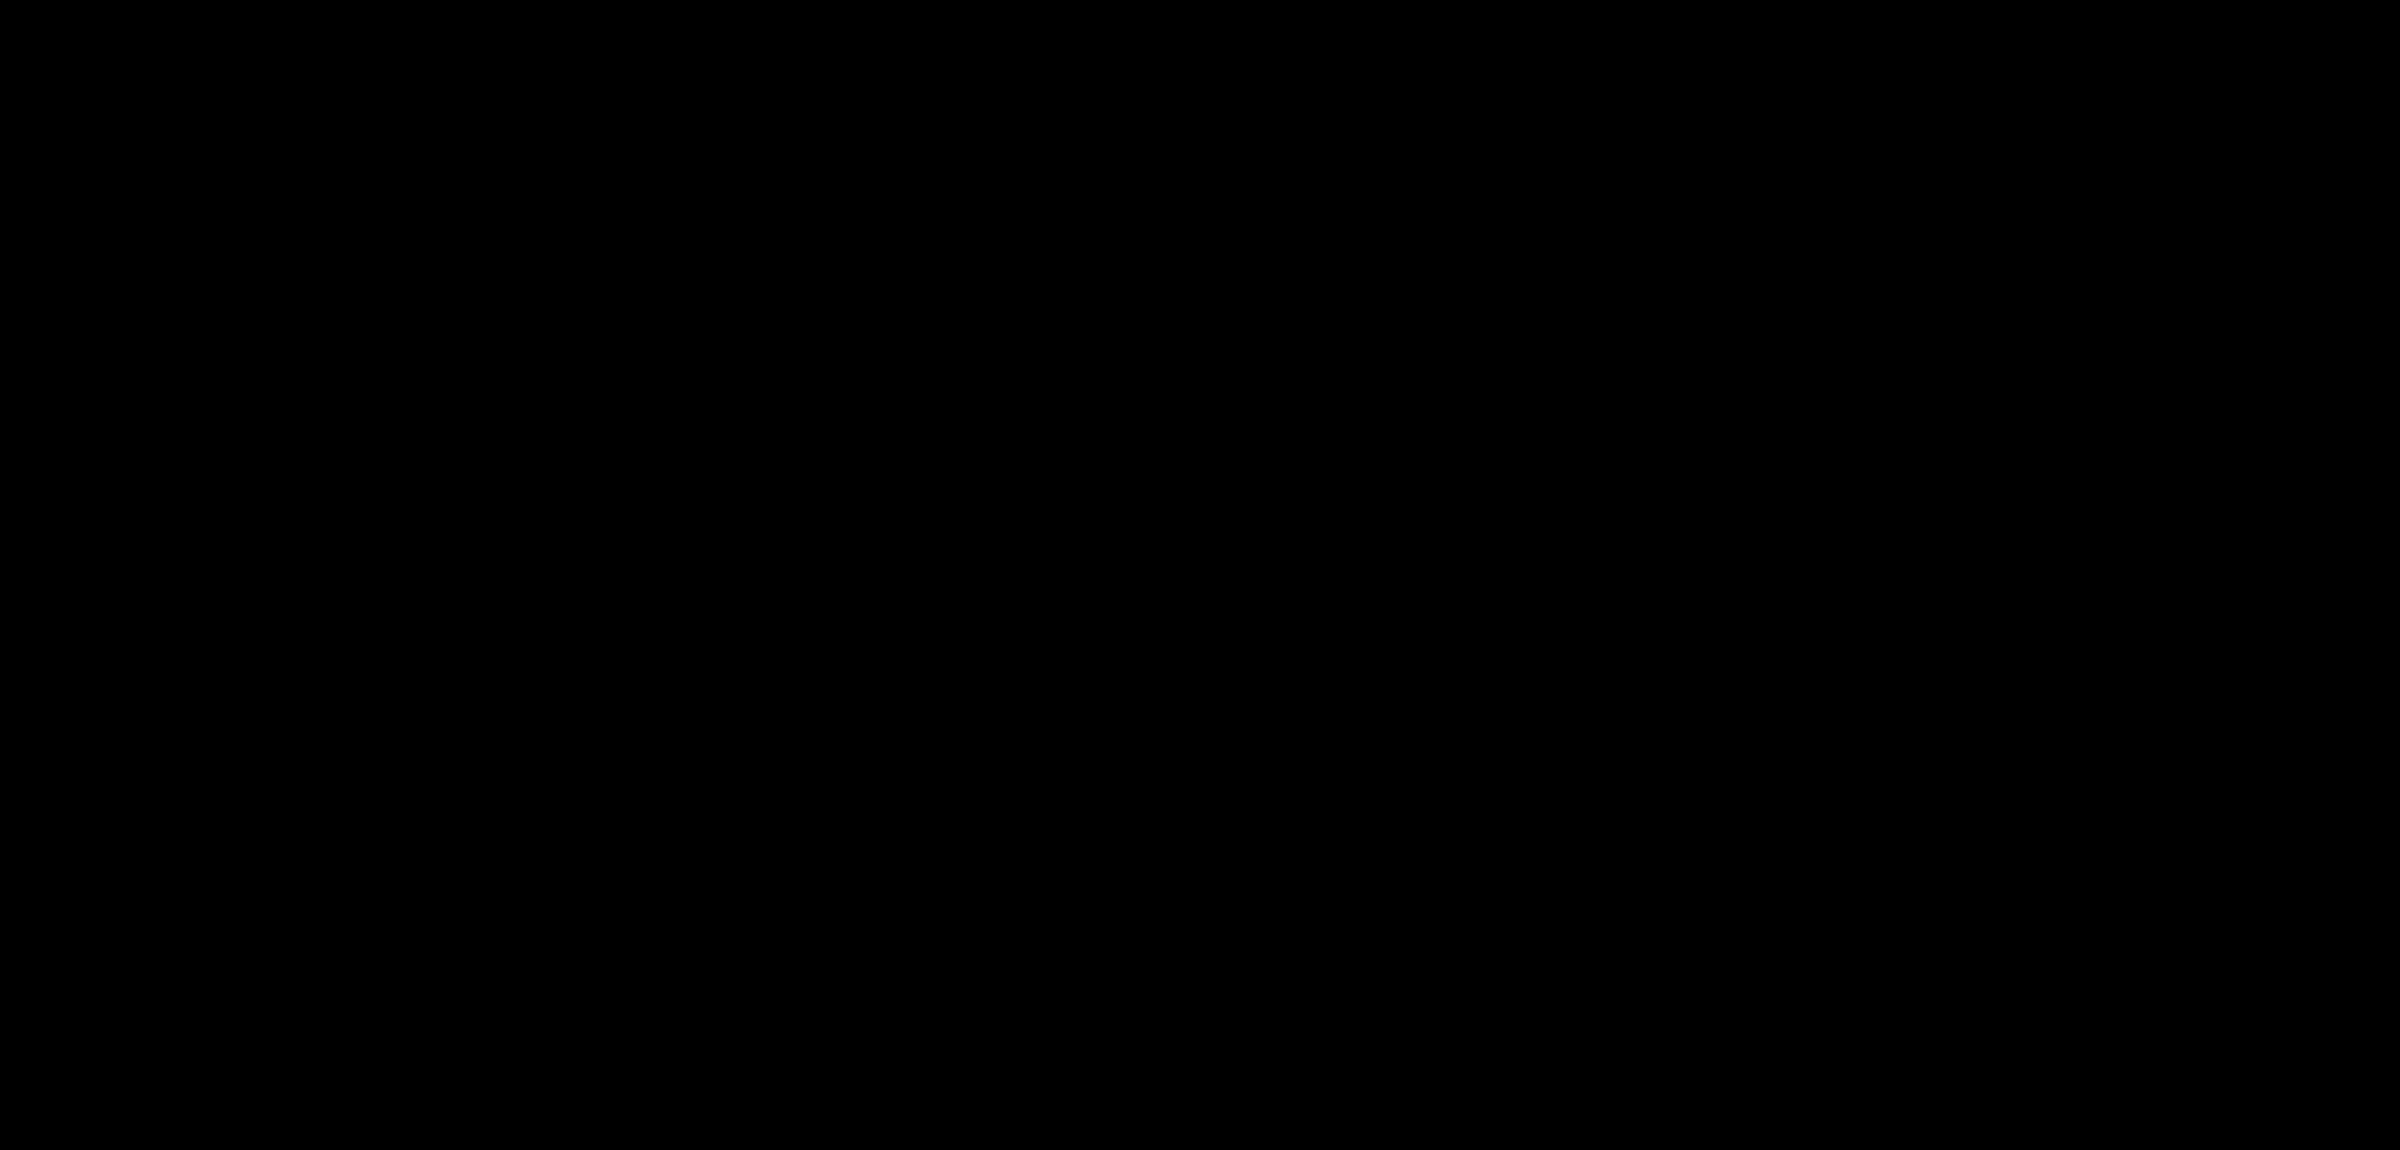 2400x1150 Clipart